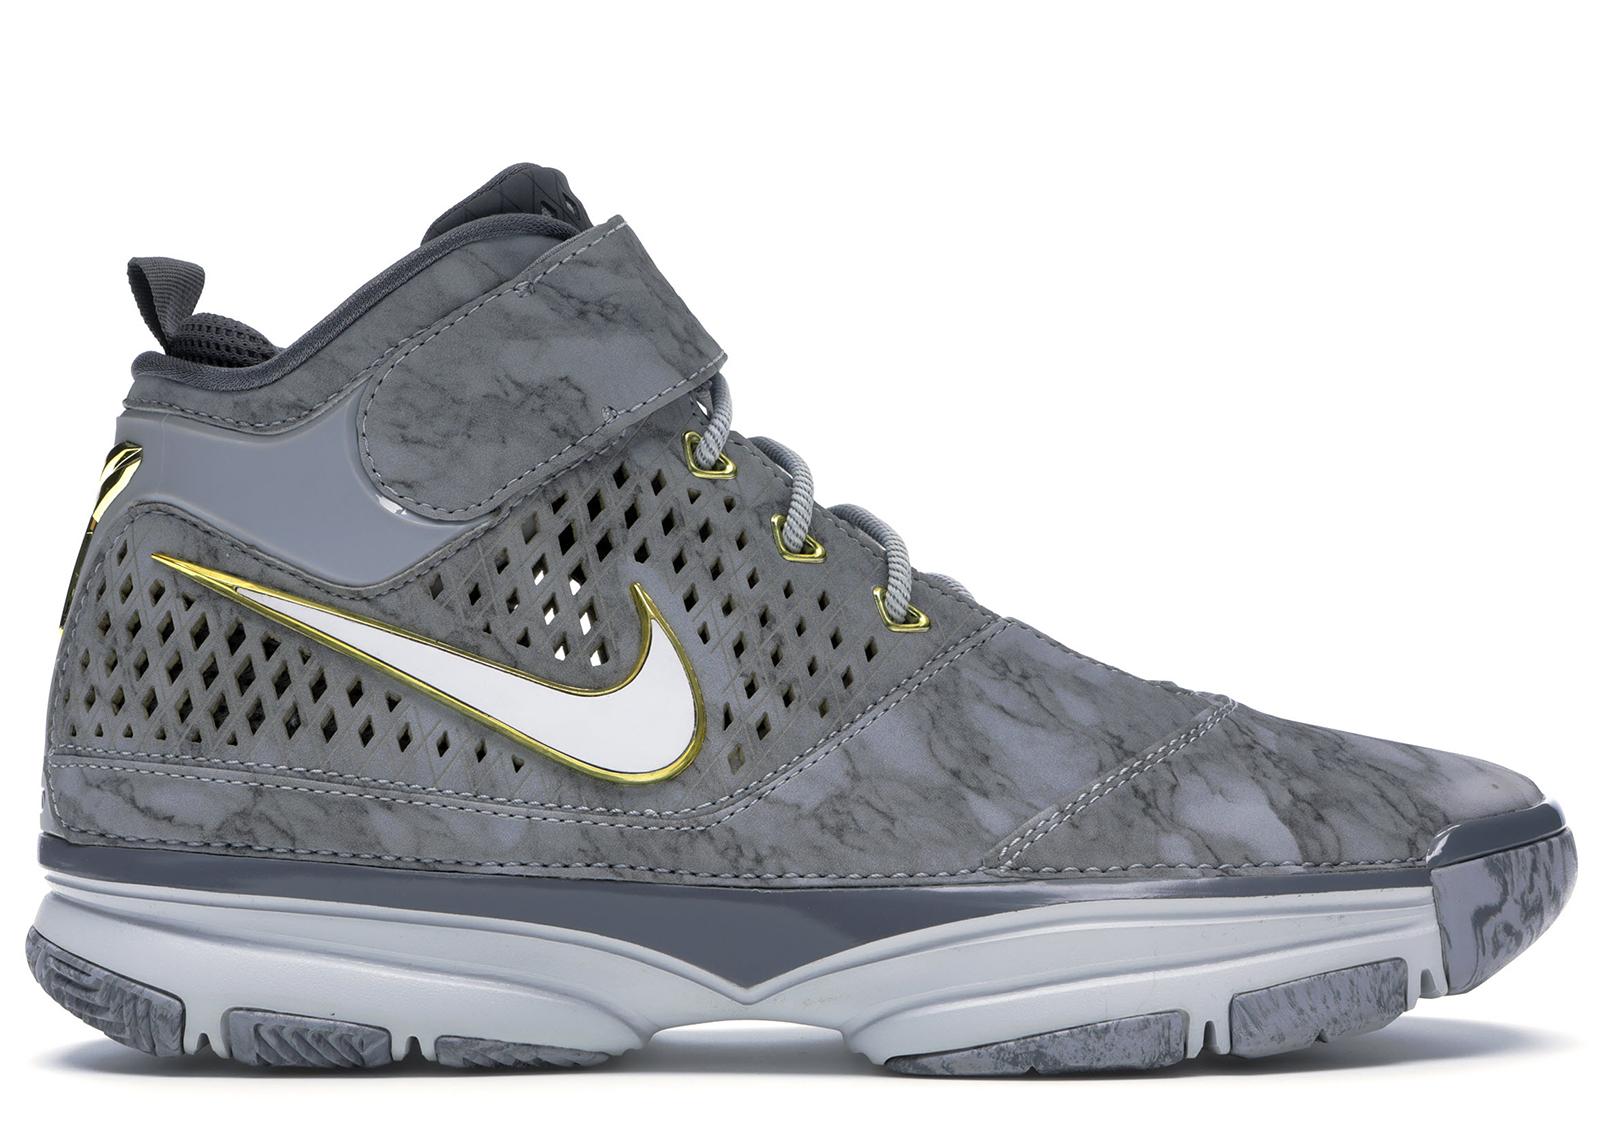 Nike Kobe 2 Prelude (4/50 Points)